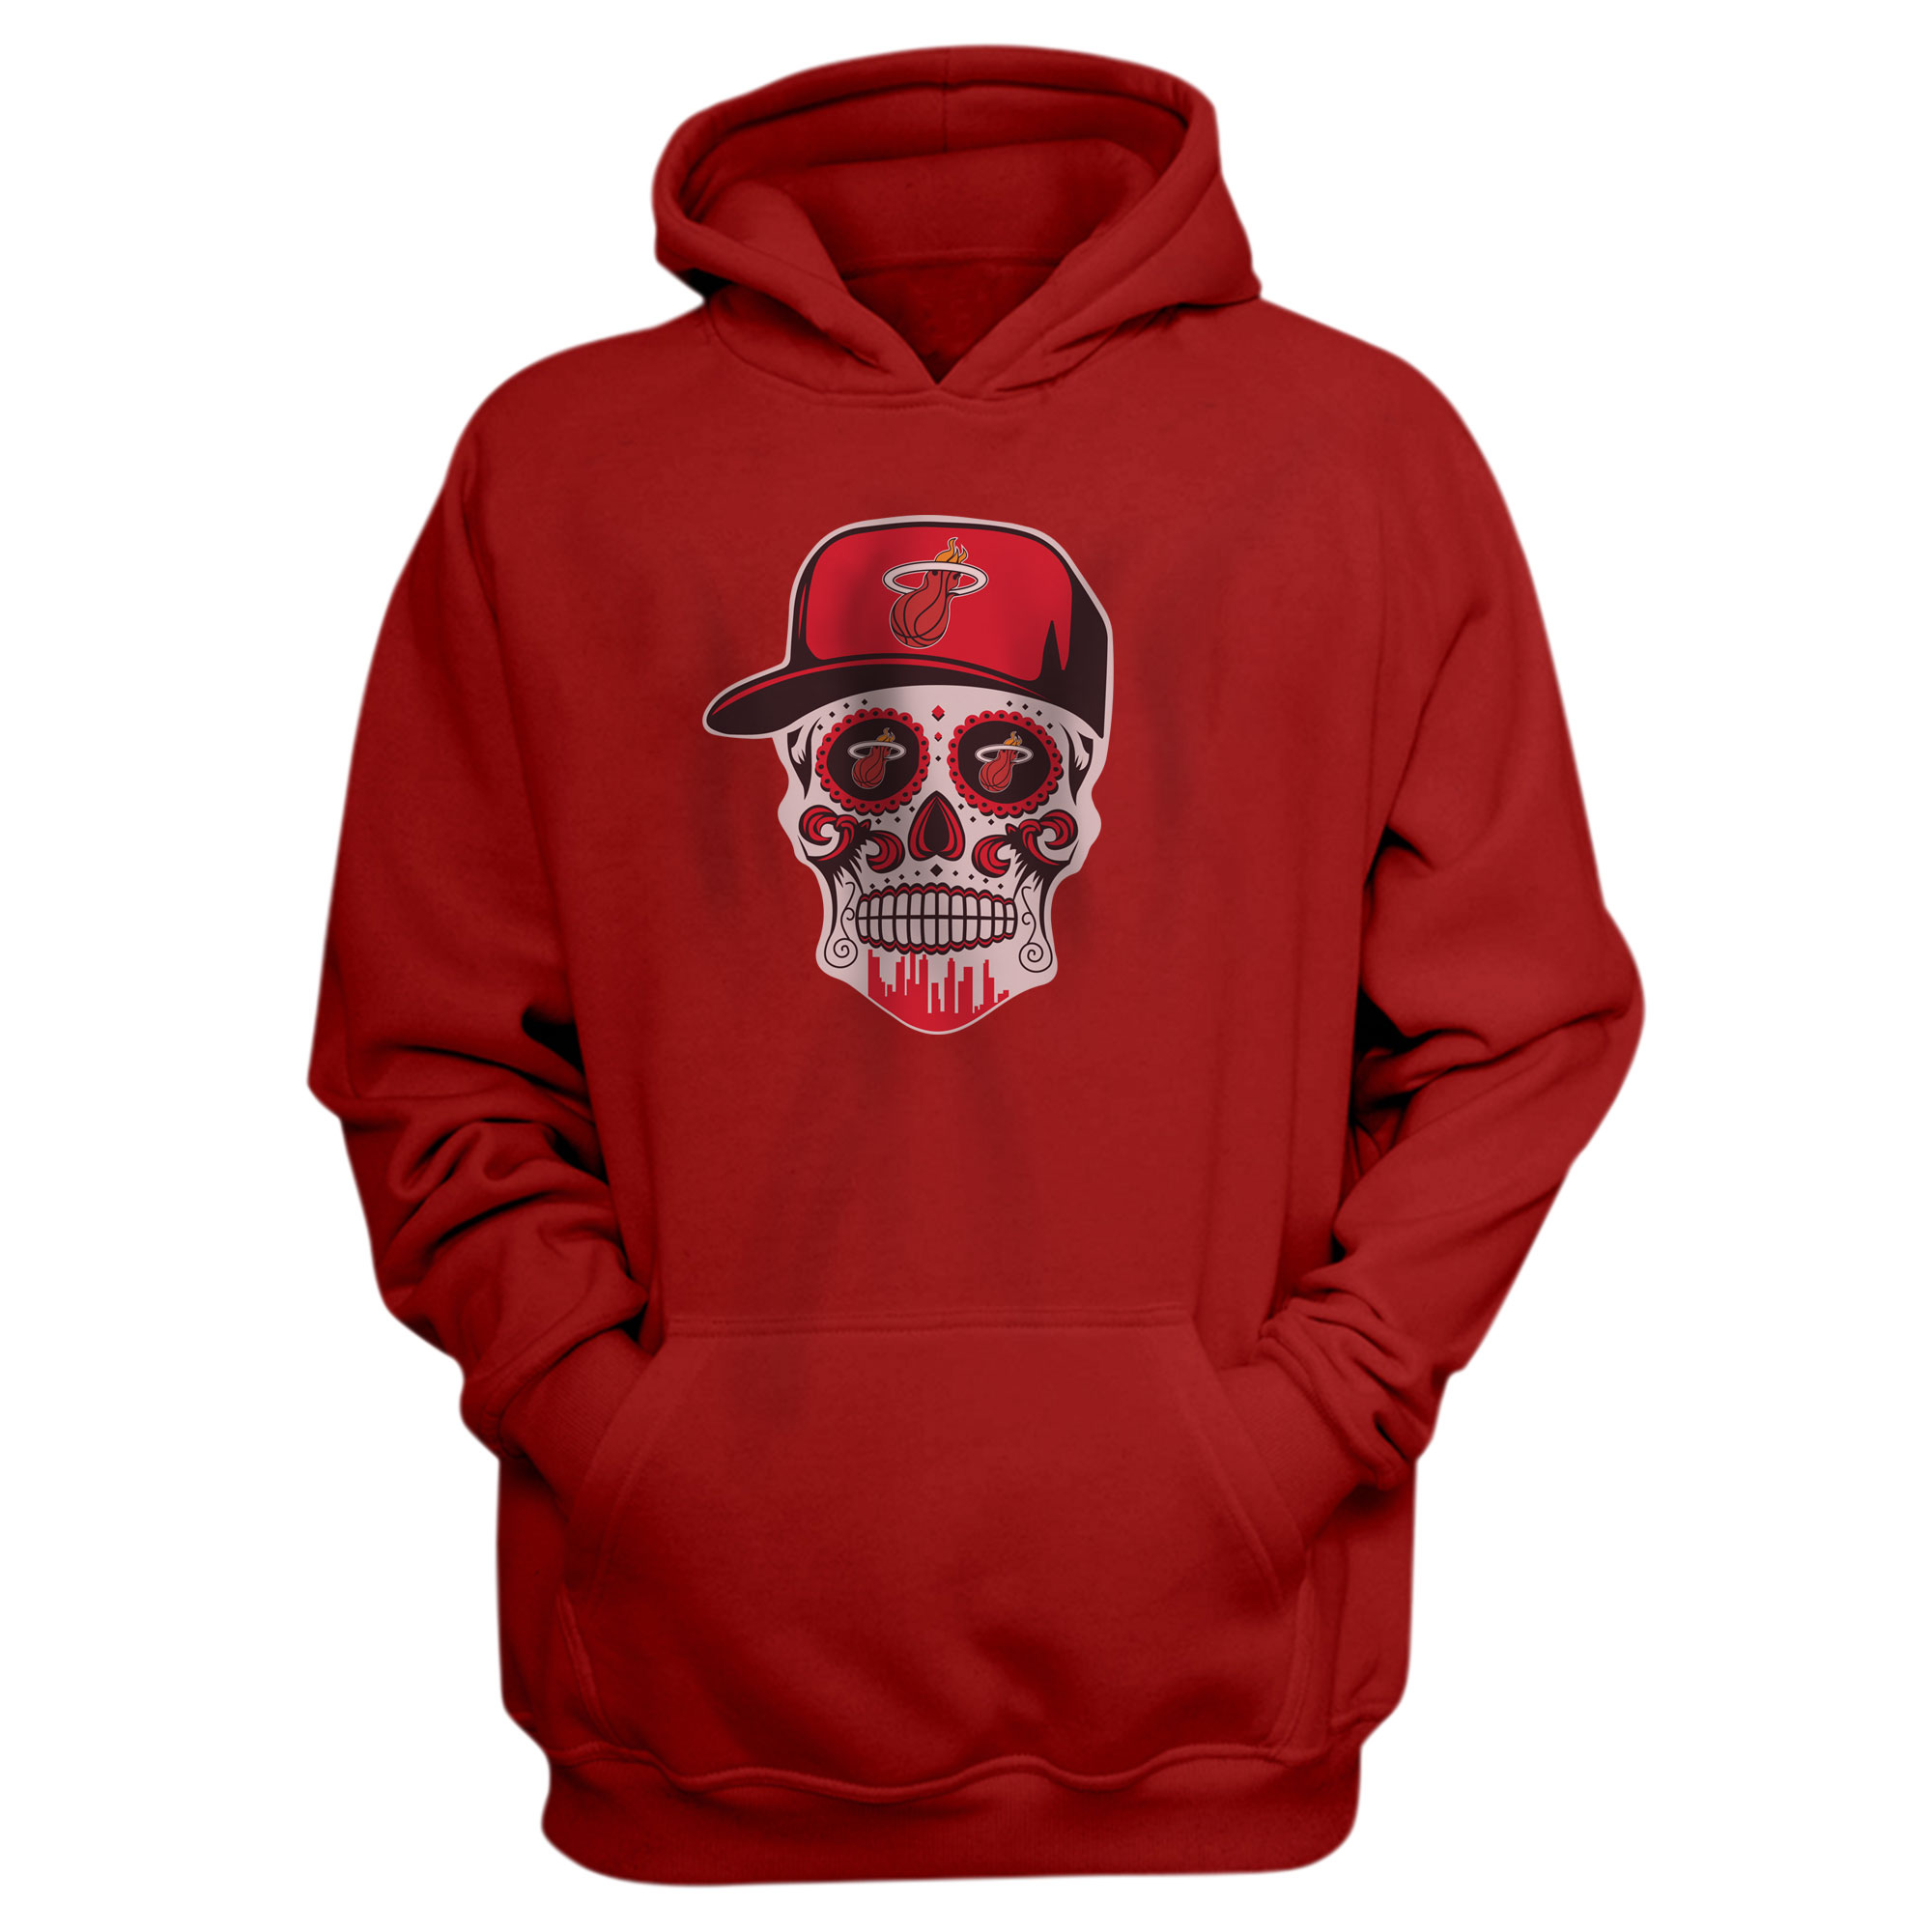 Heat Skull Hoodie  (HD-RED-NP-456-NBA-MIAMI-SKULL)